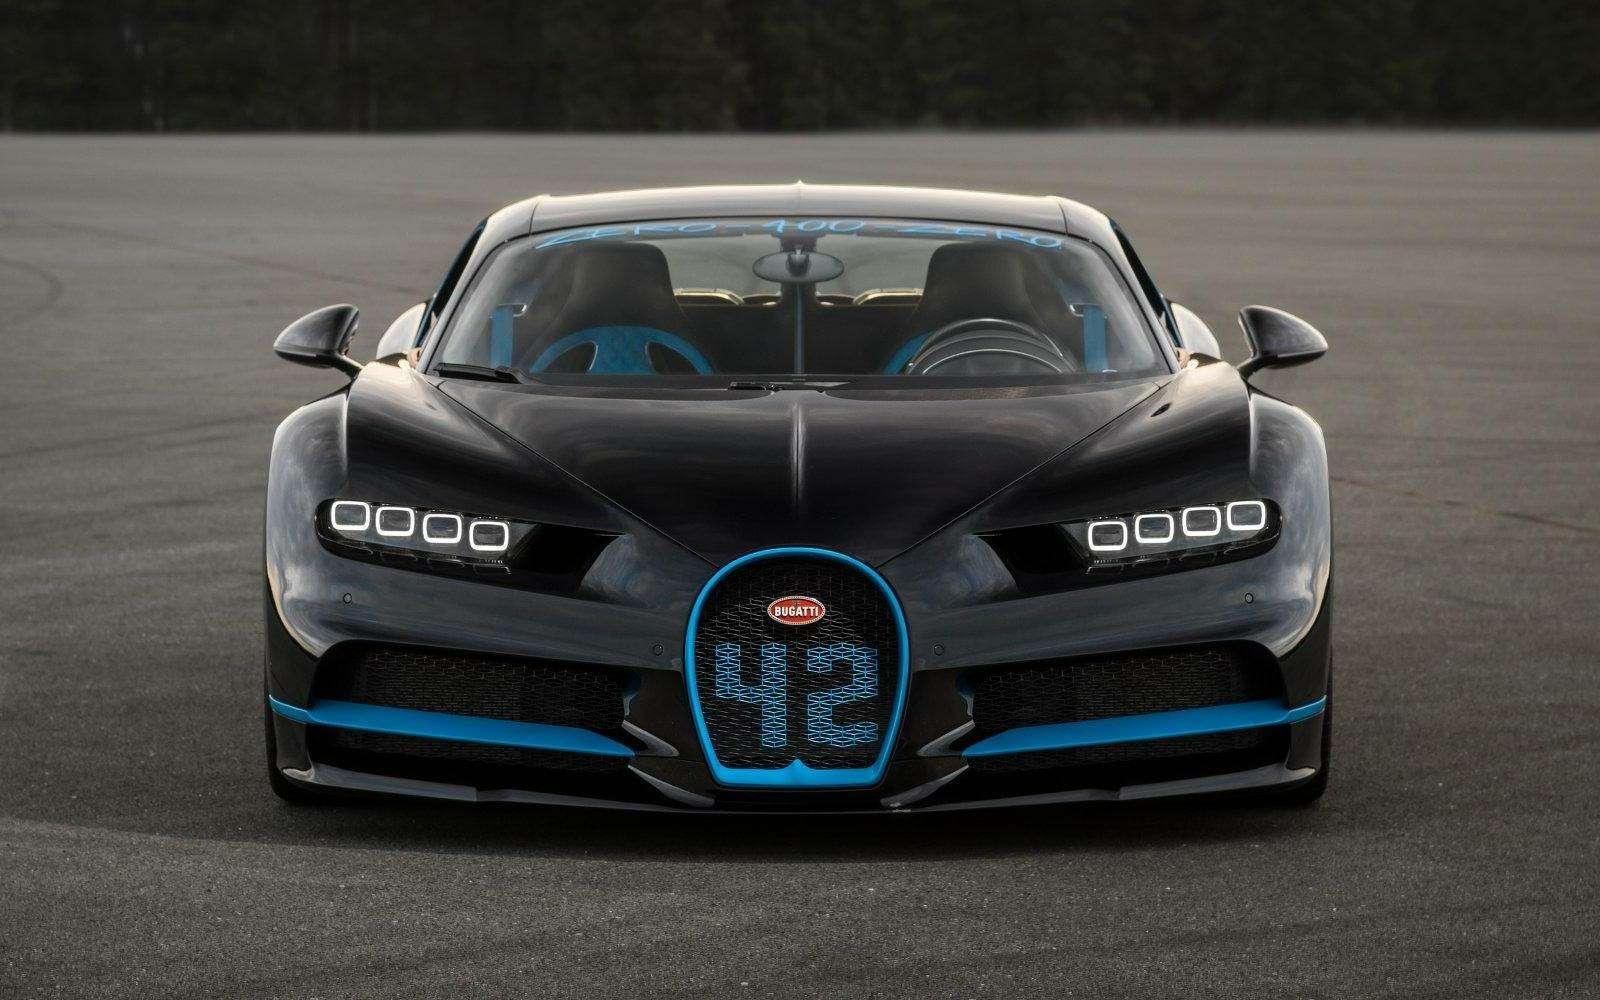 0-400-0 км/ч— видео рекордного заезда Bugatti Chiron— фото 794902